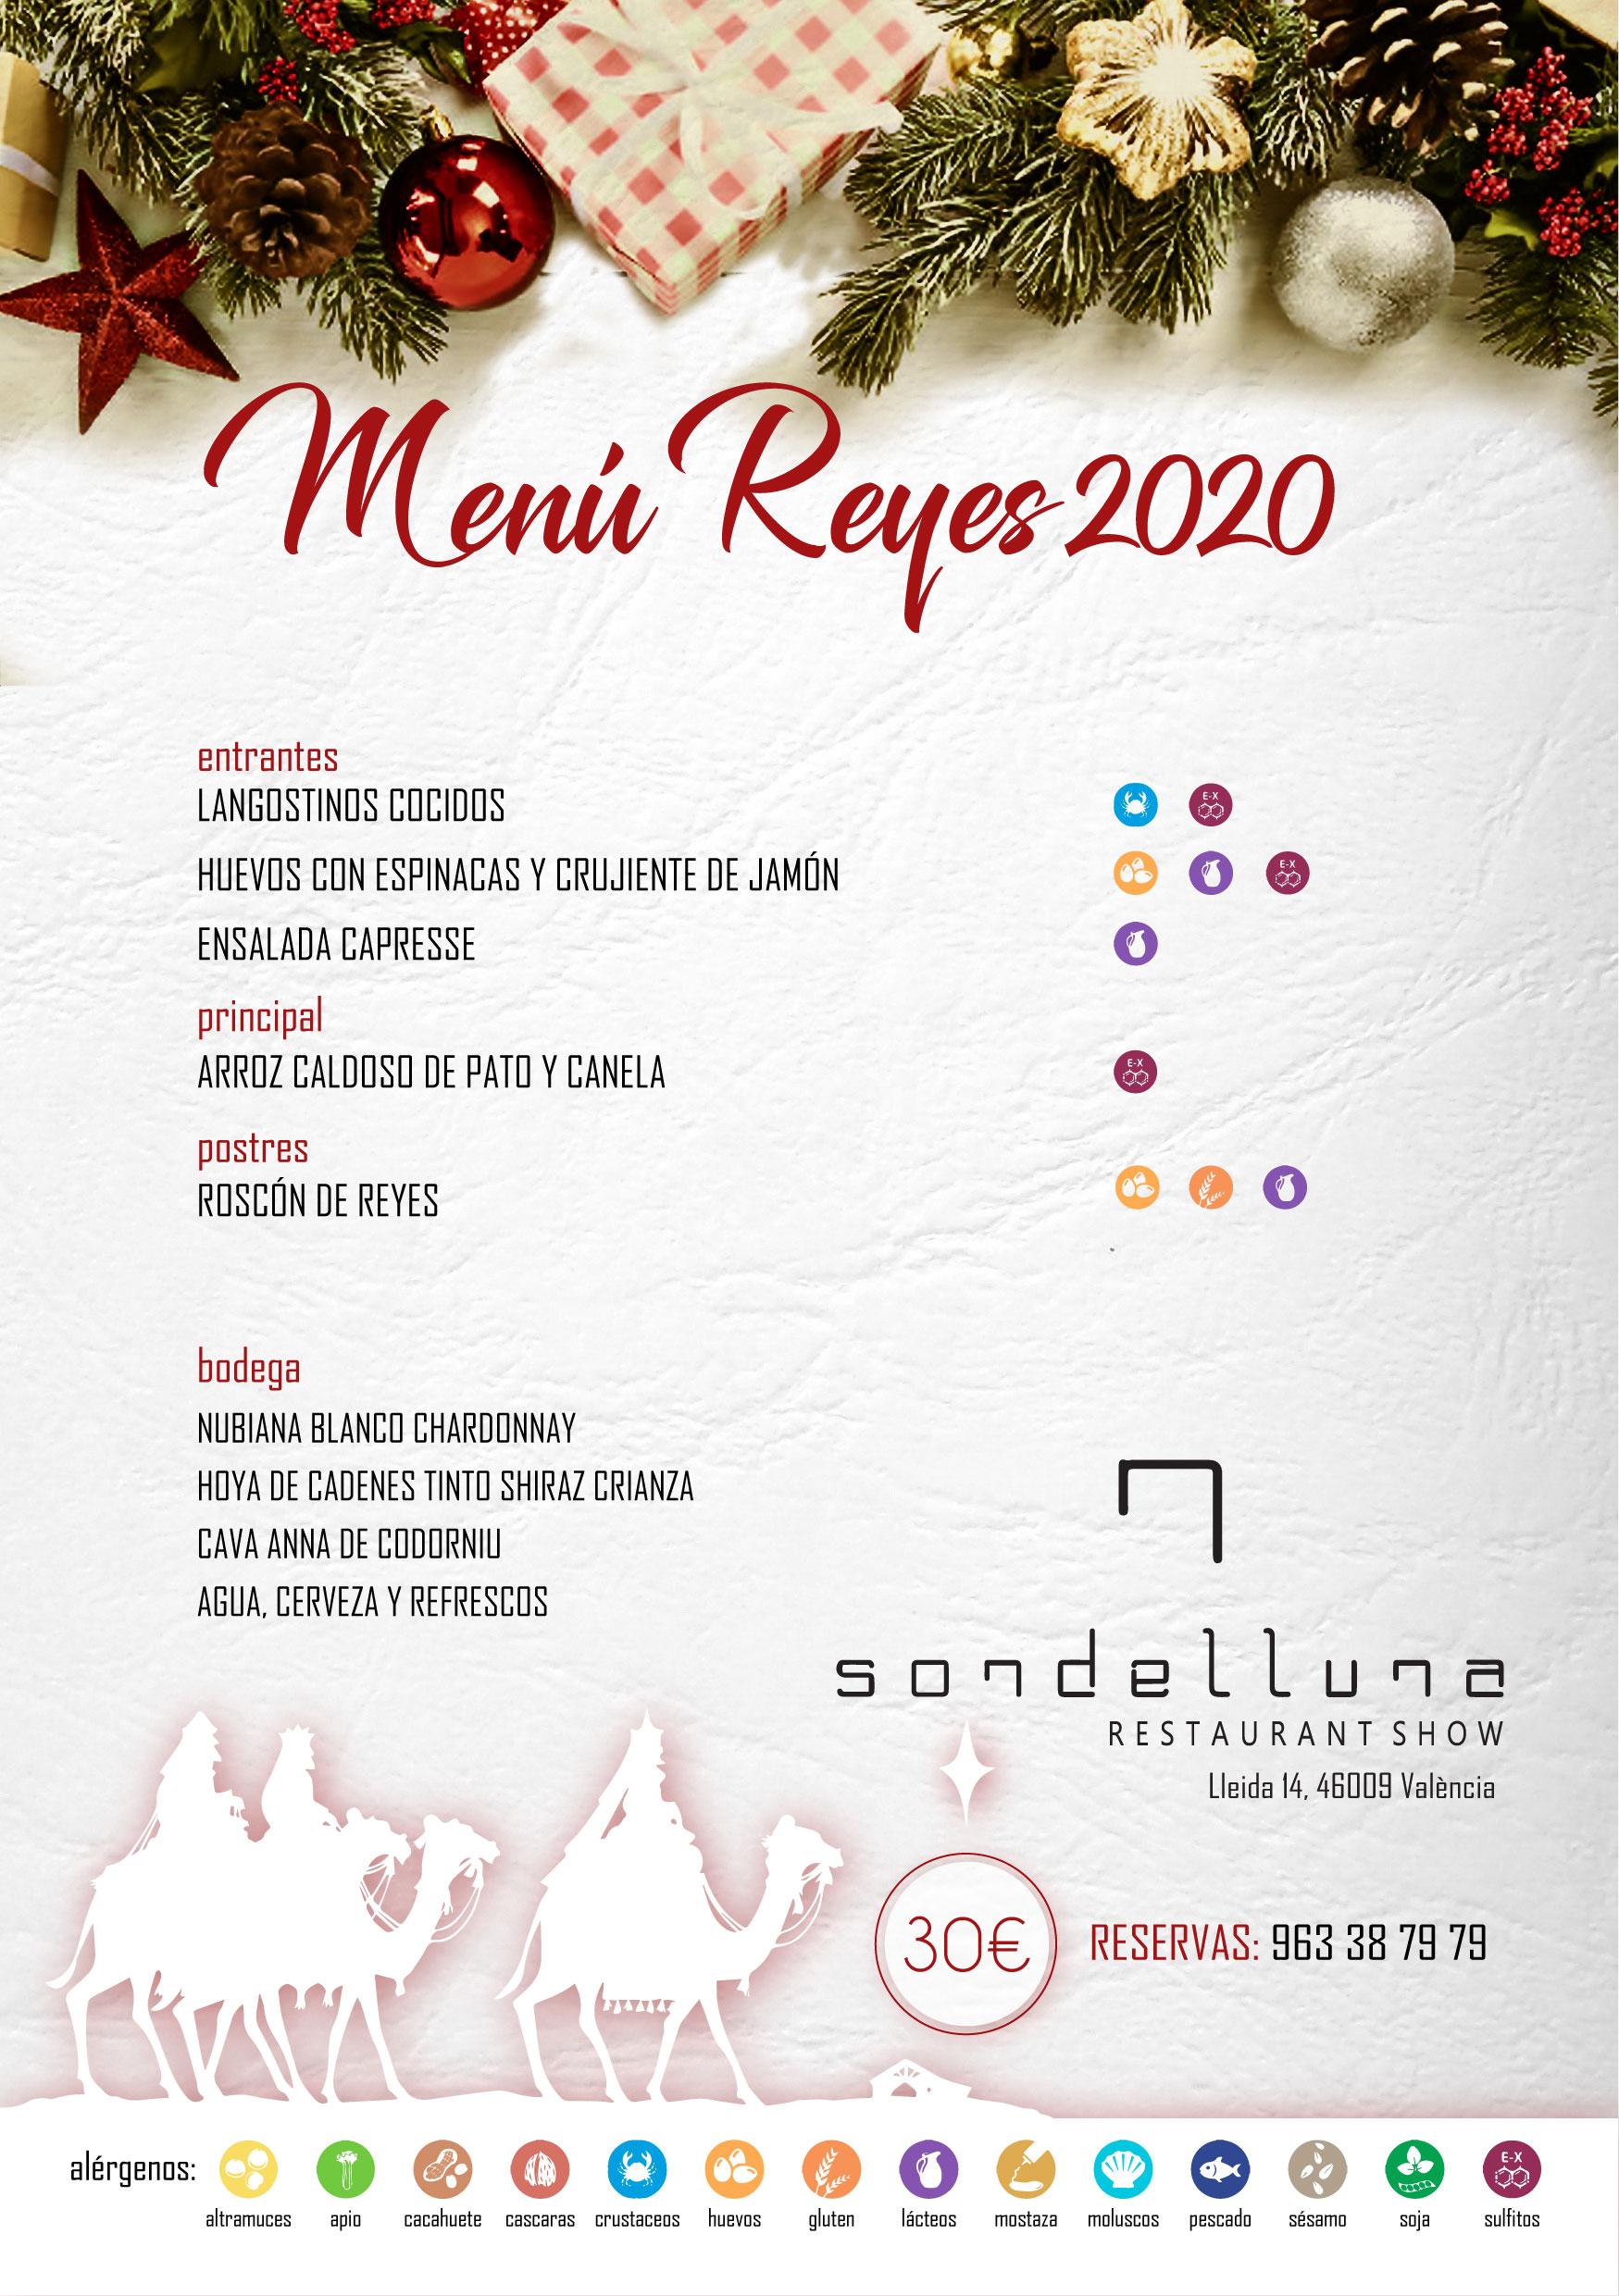 reyes30-2020-sondelluna